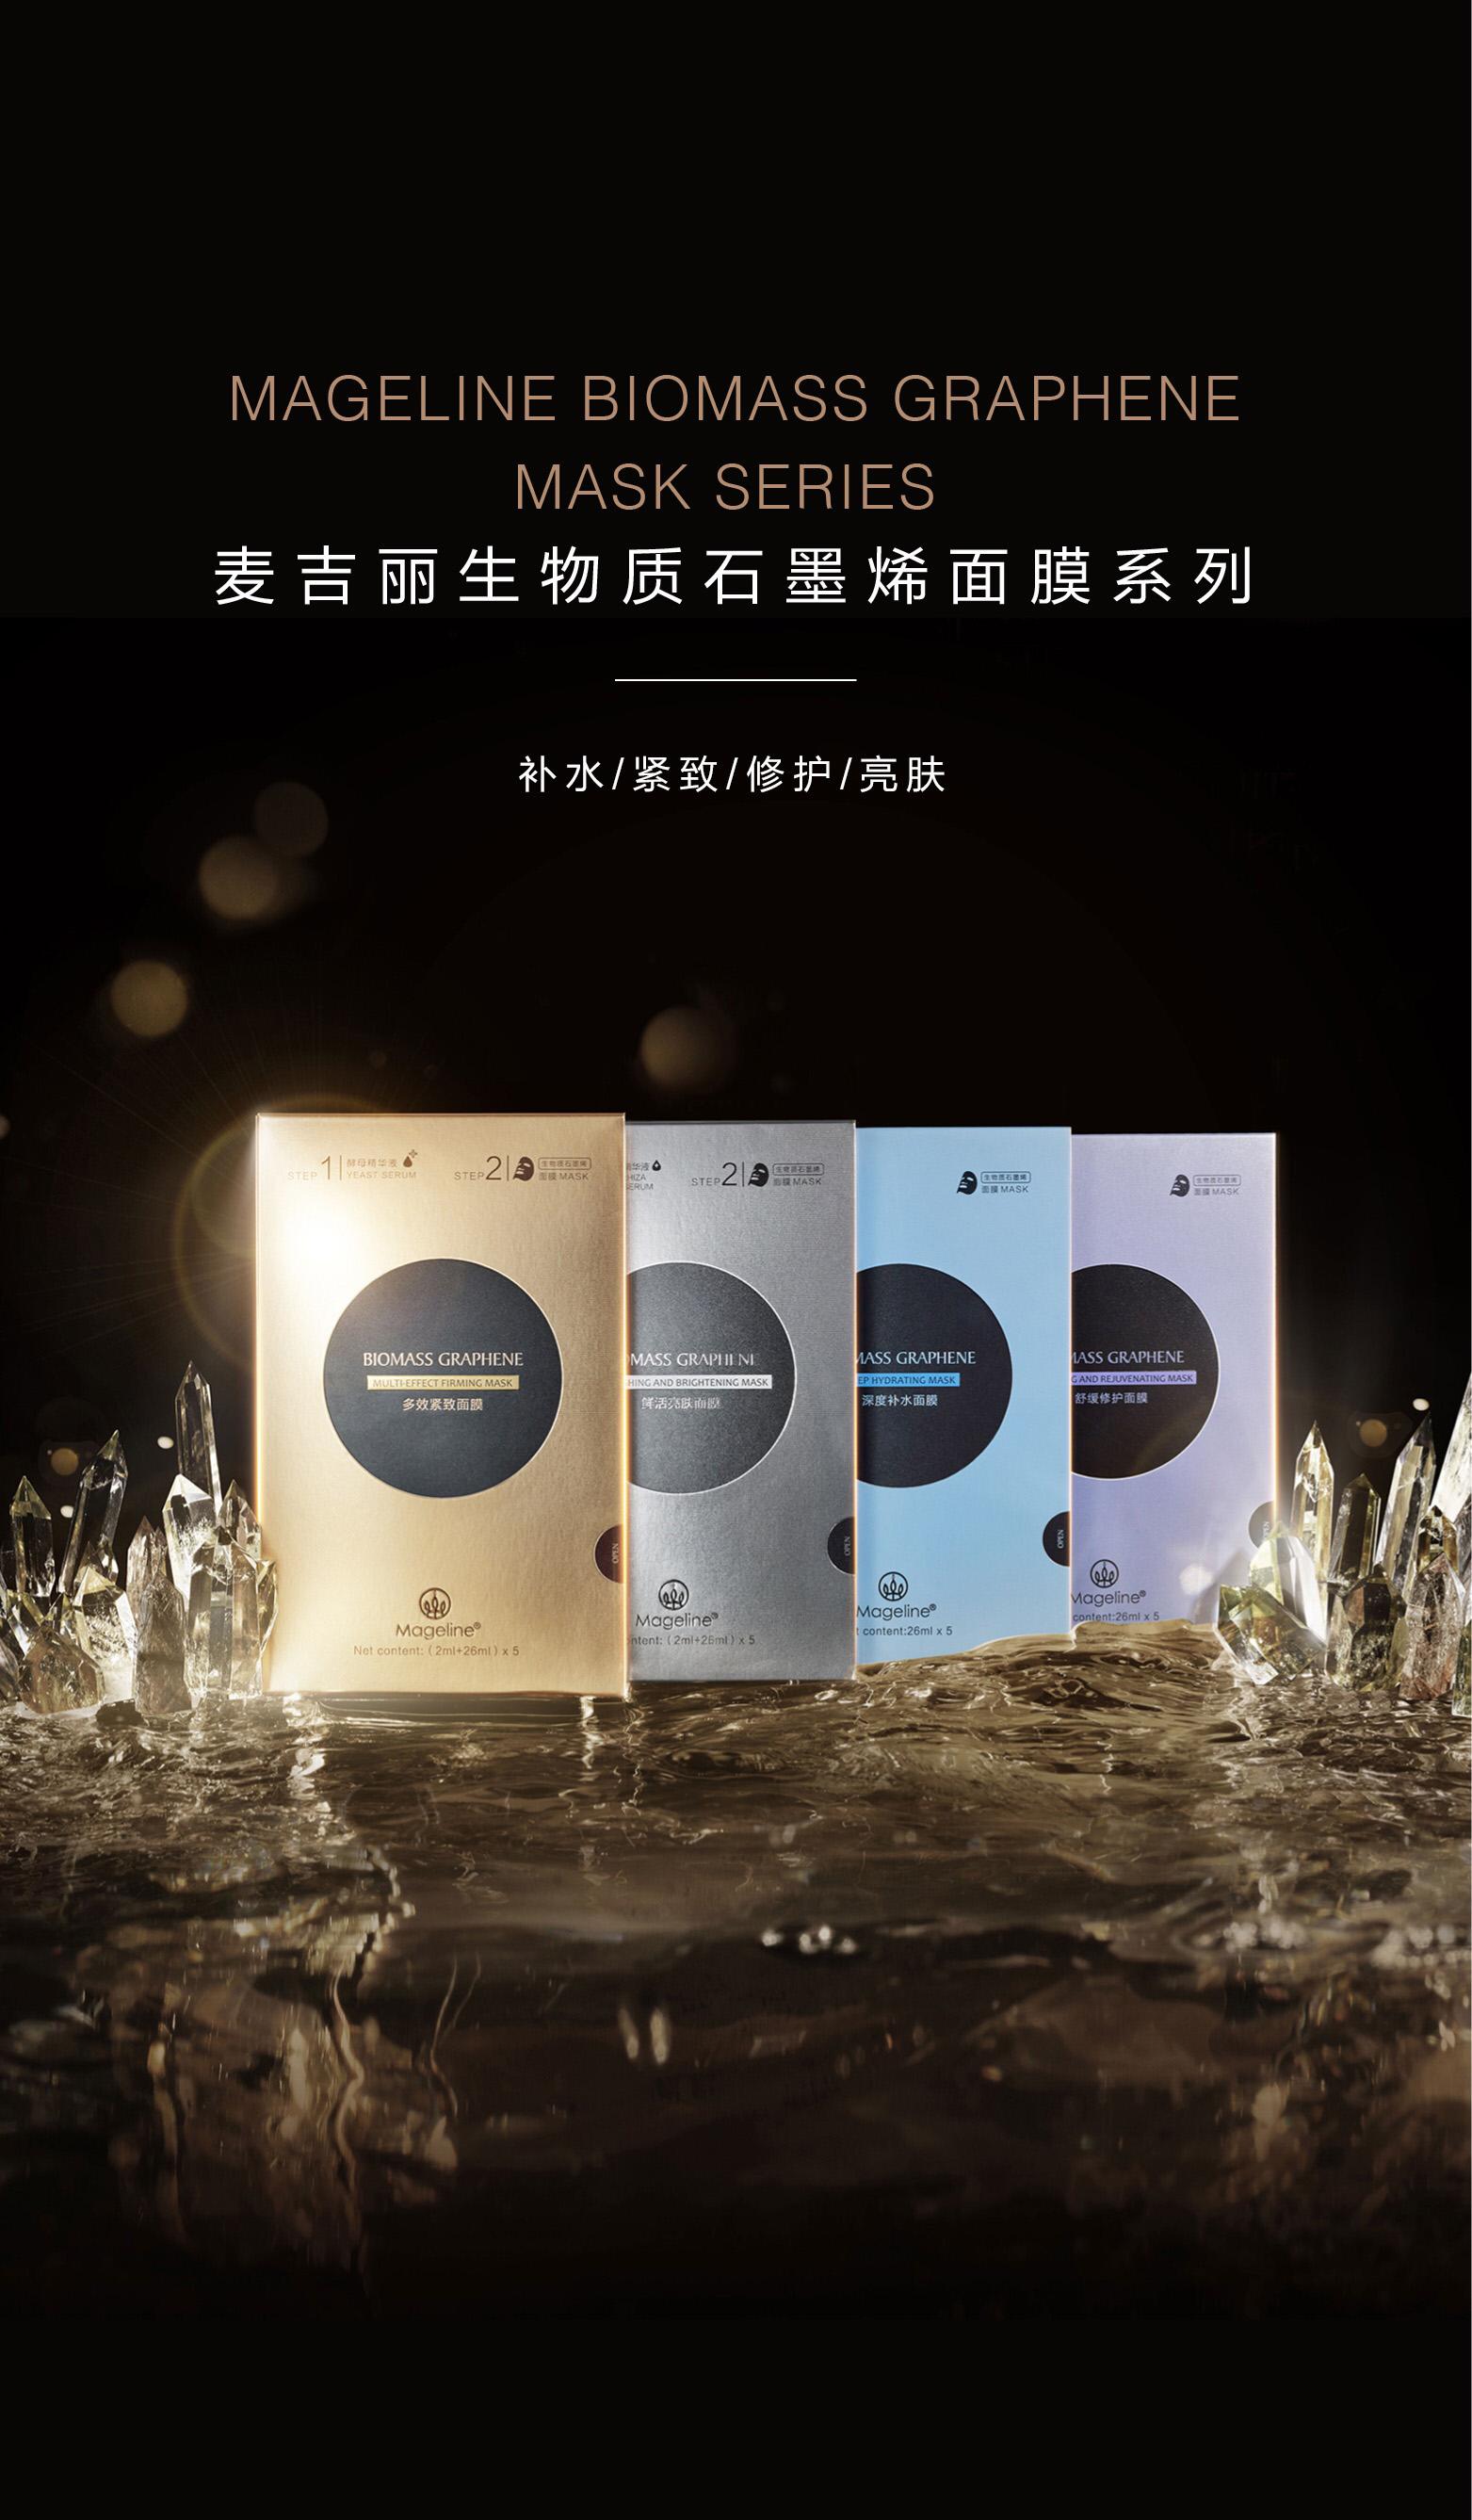 http://www.kzmahc.tw/meizhuangrihua/494451.html